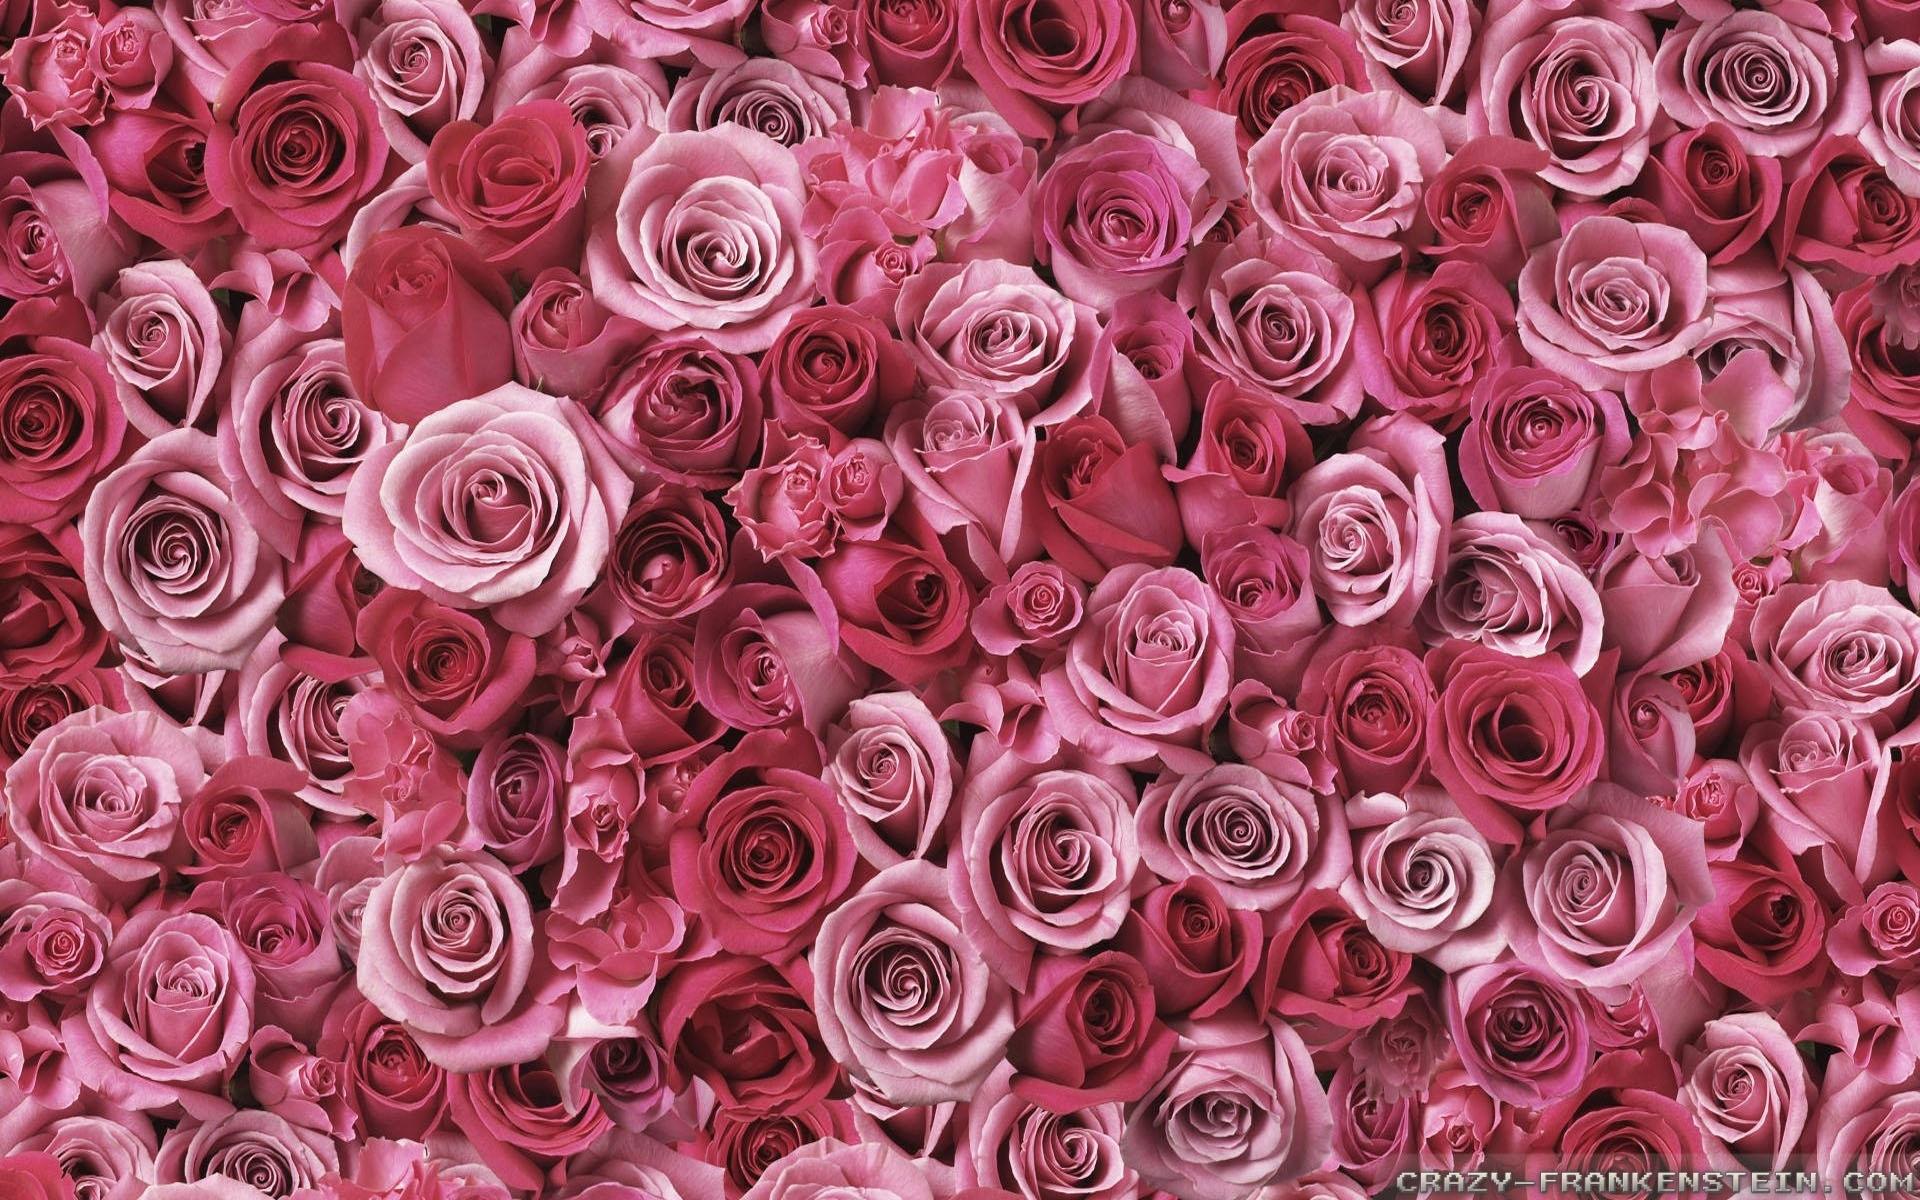 pink rose wallpapers 2 - crazy frankenstein